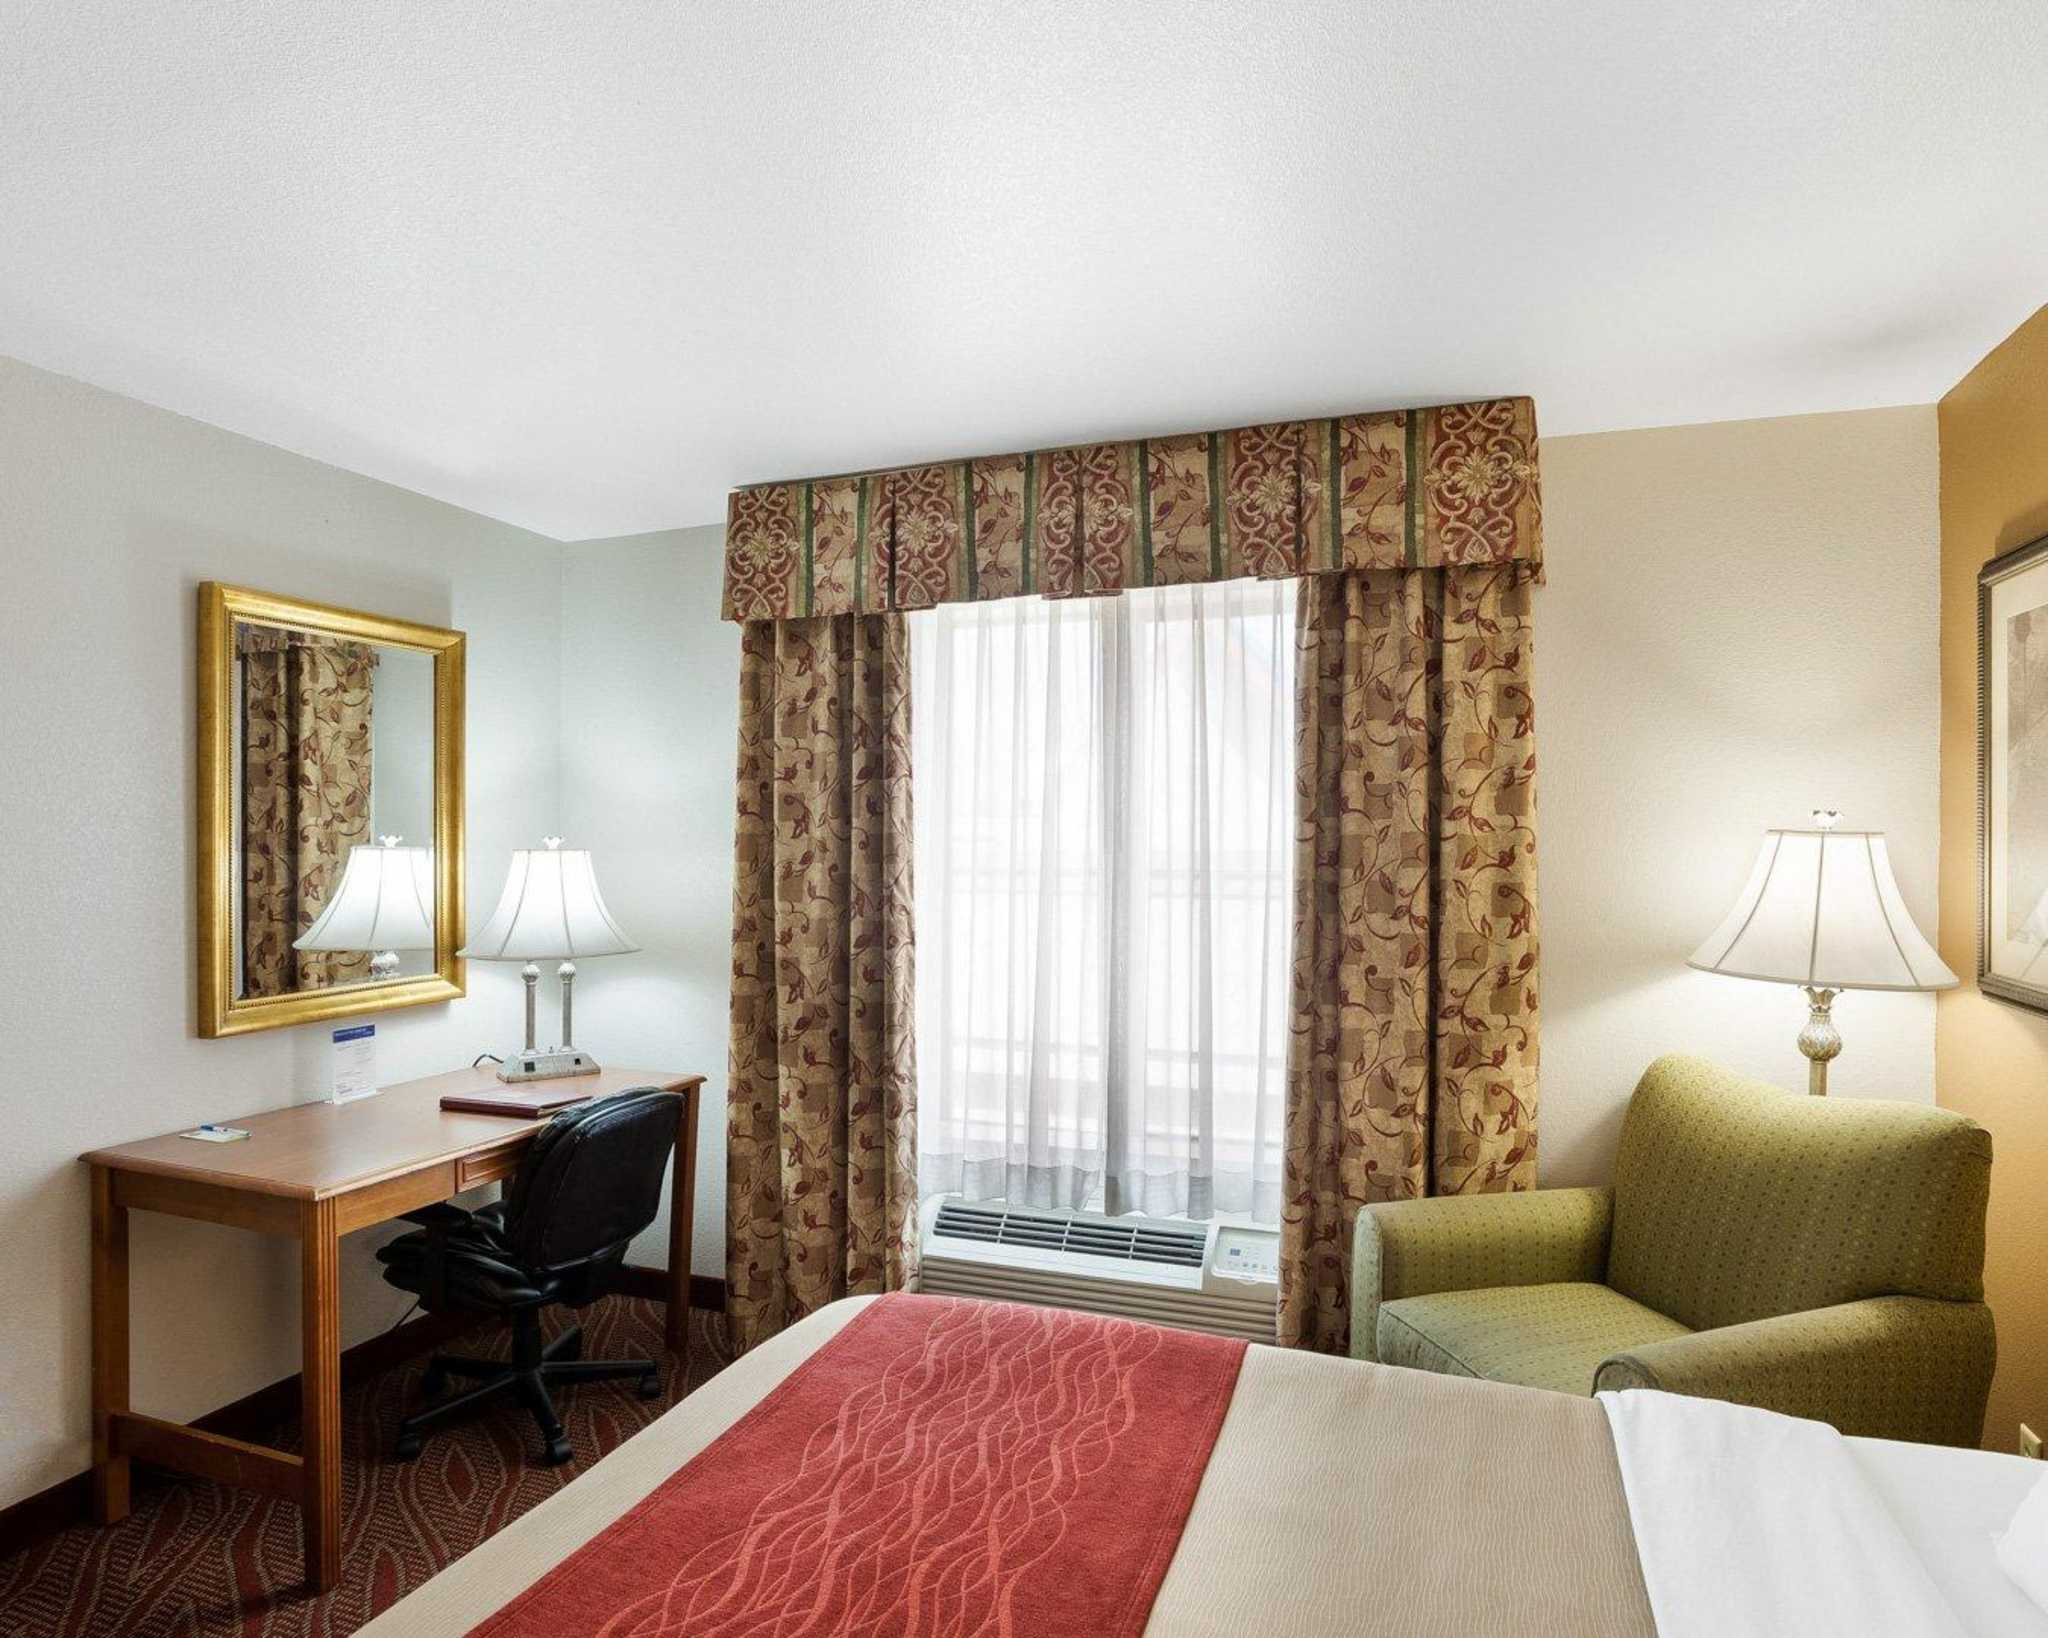 Comfort Inn & Suites Near Medical Center image 4